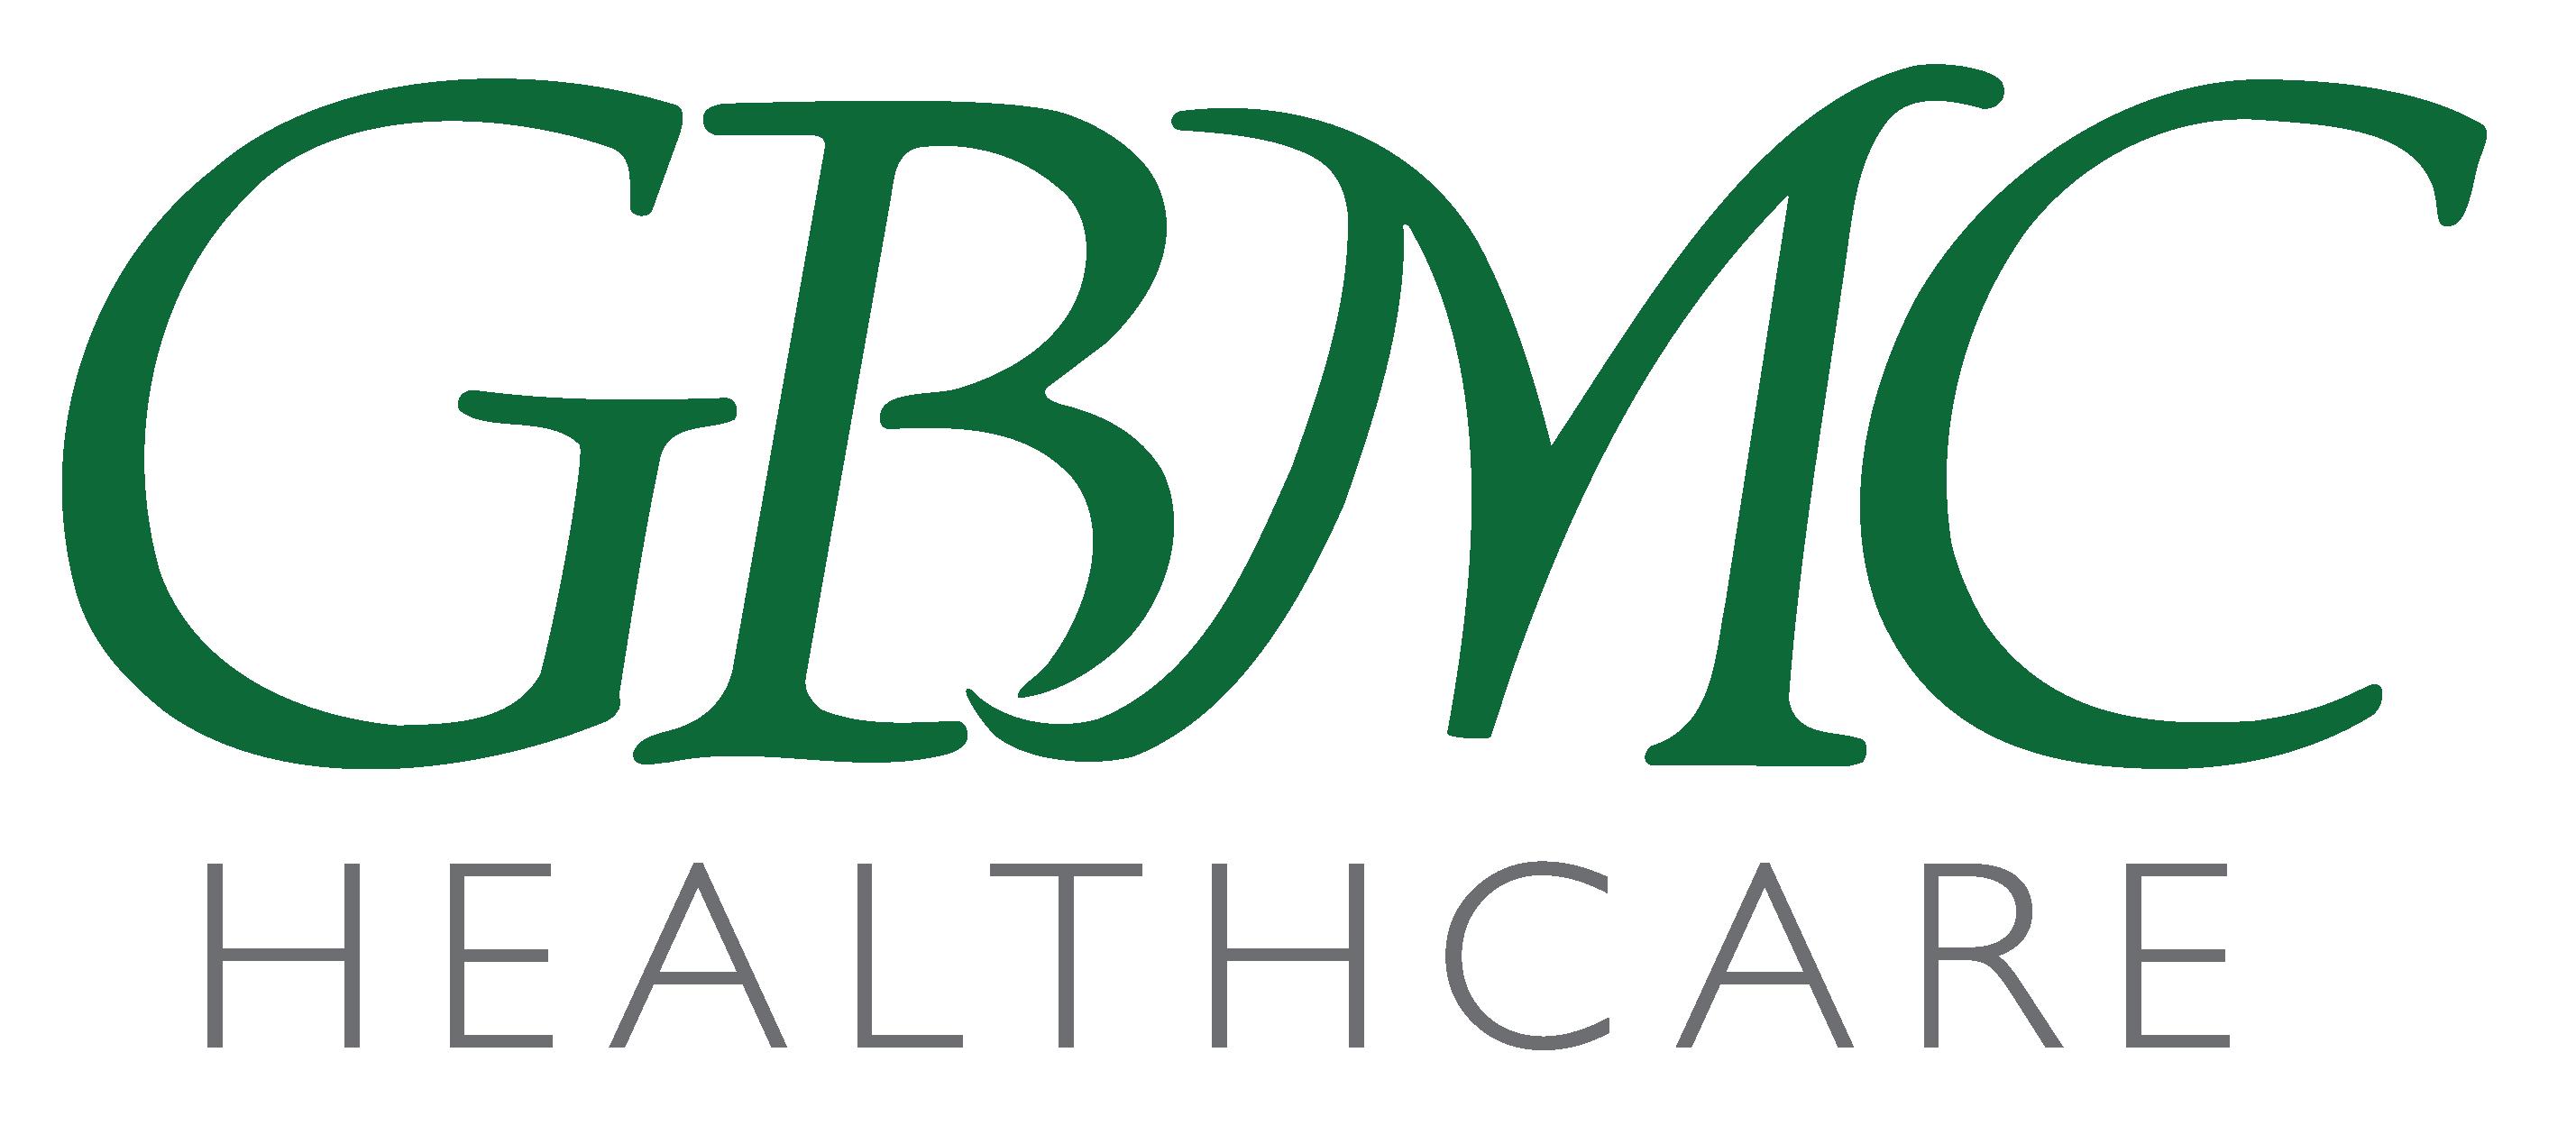 GBMC_HealthCare_logo (1)-01